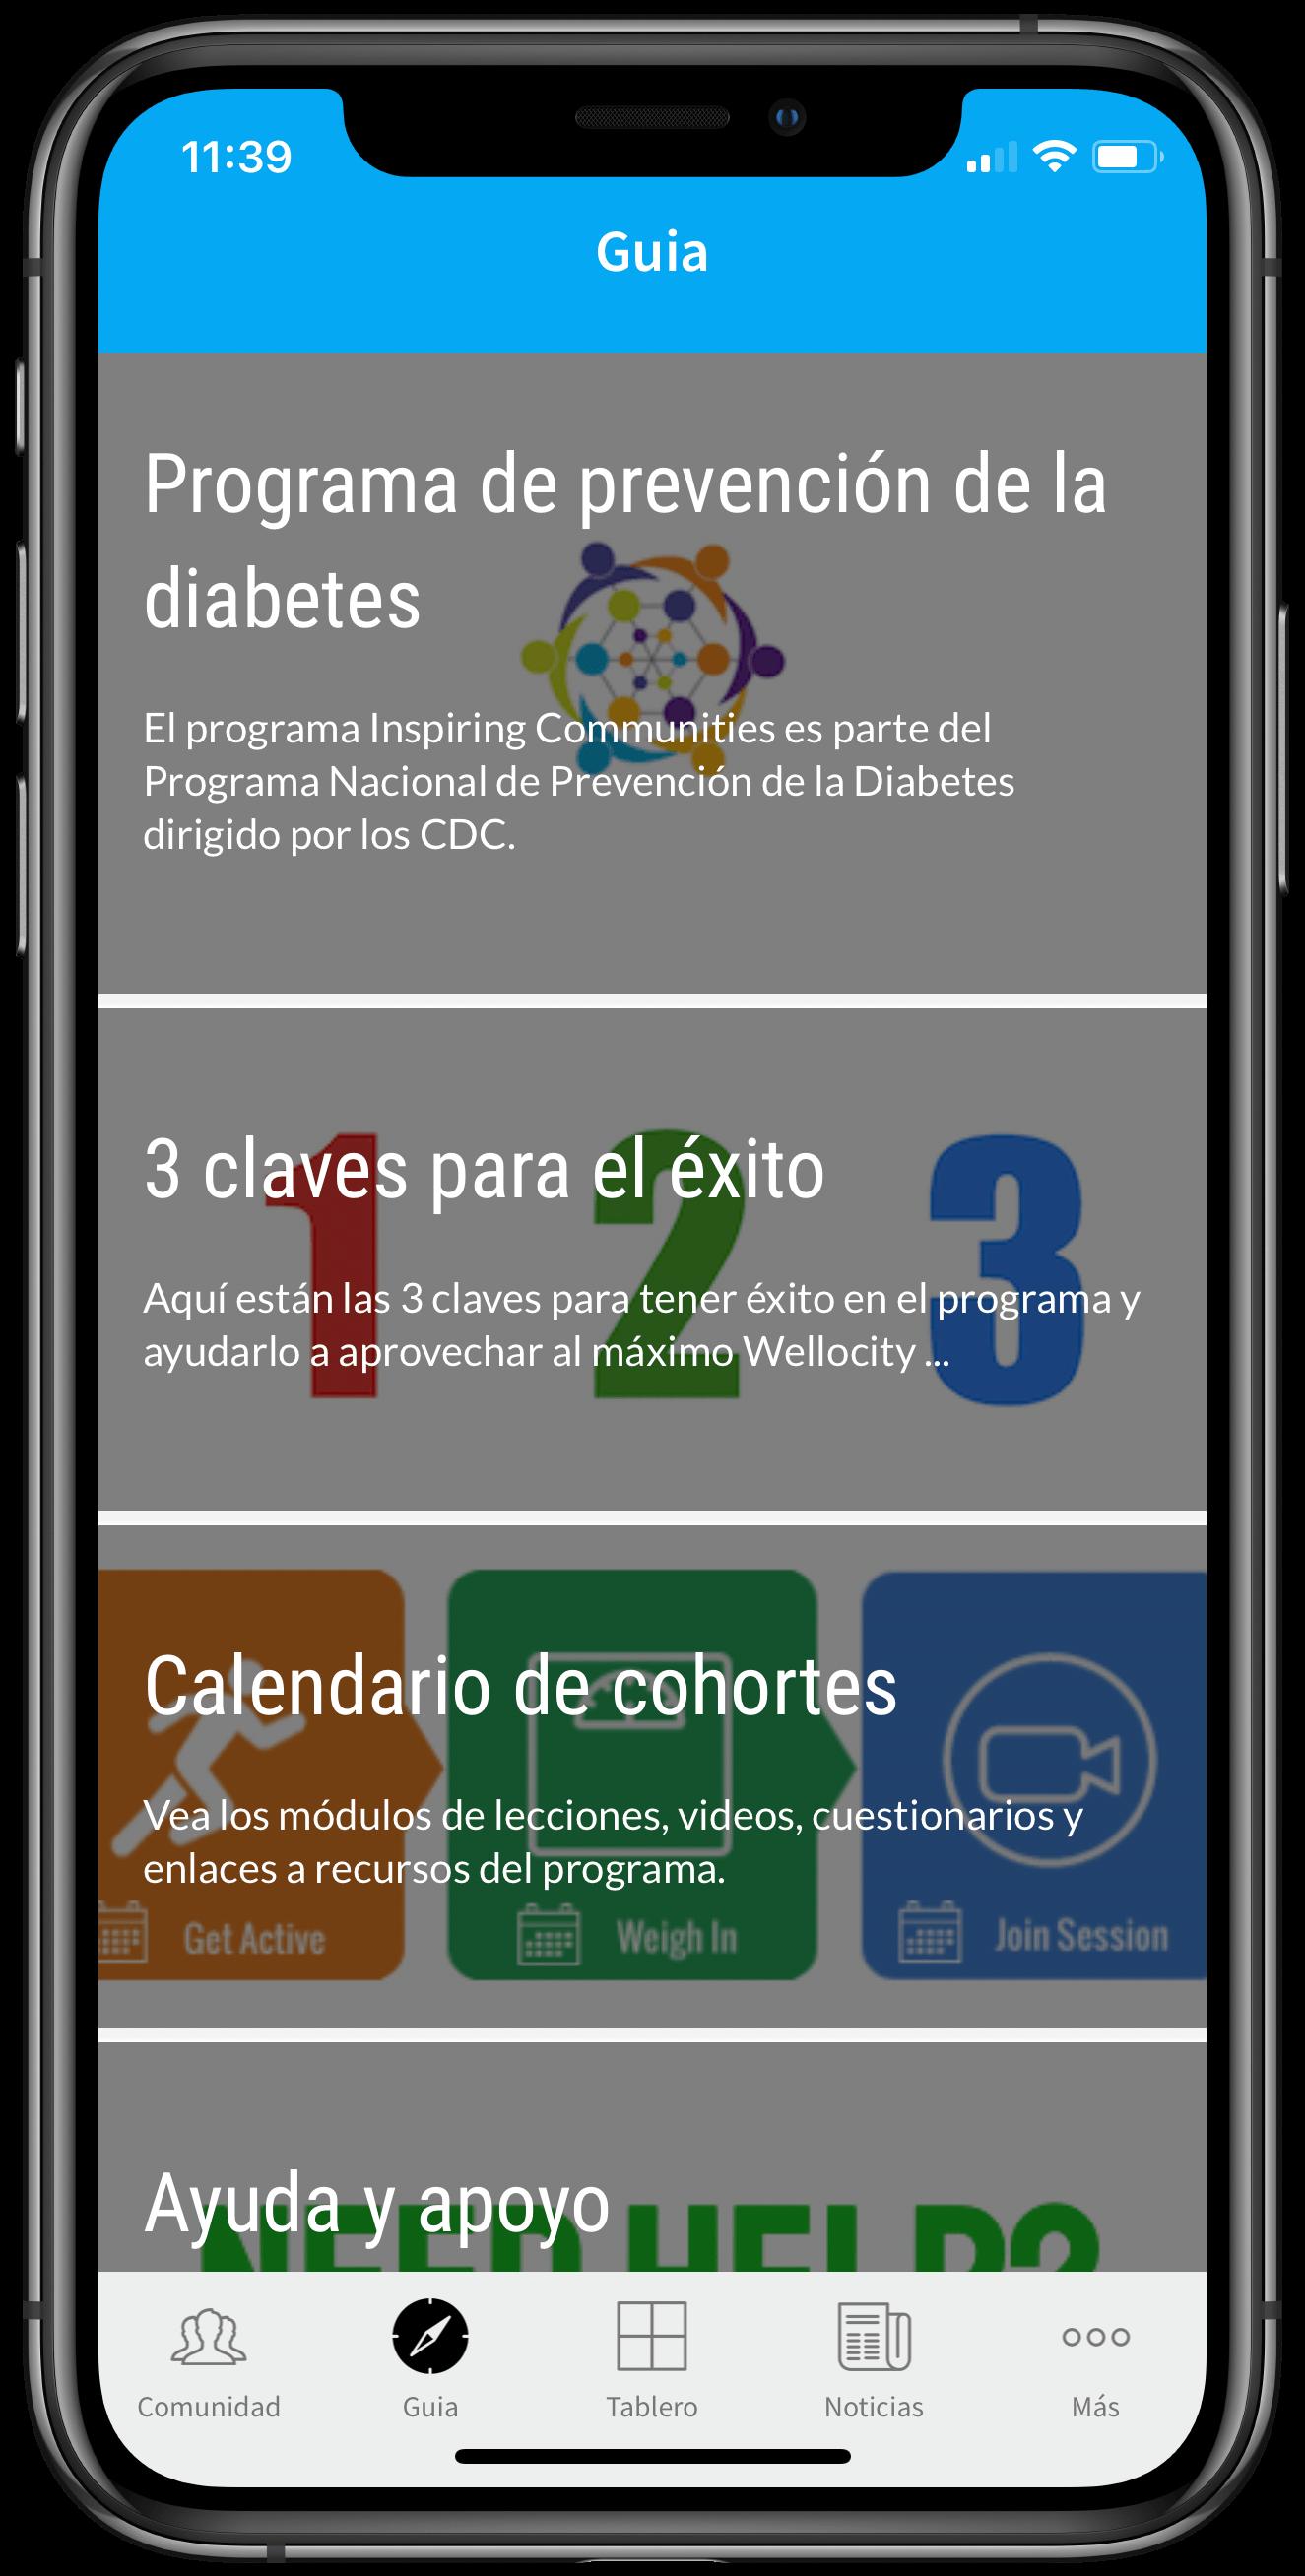 Inspiring Communities Spanish Guidannce framed iPhone XS